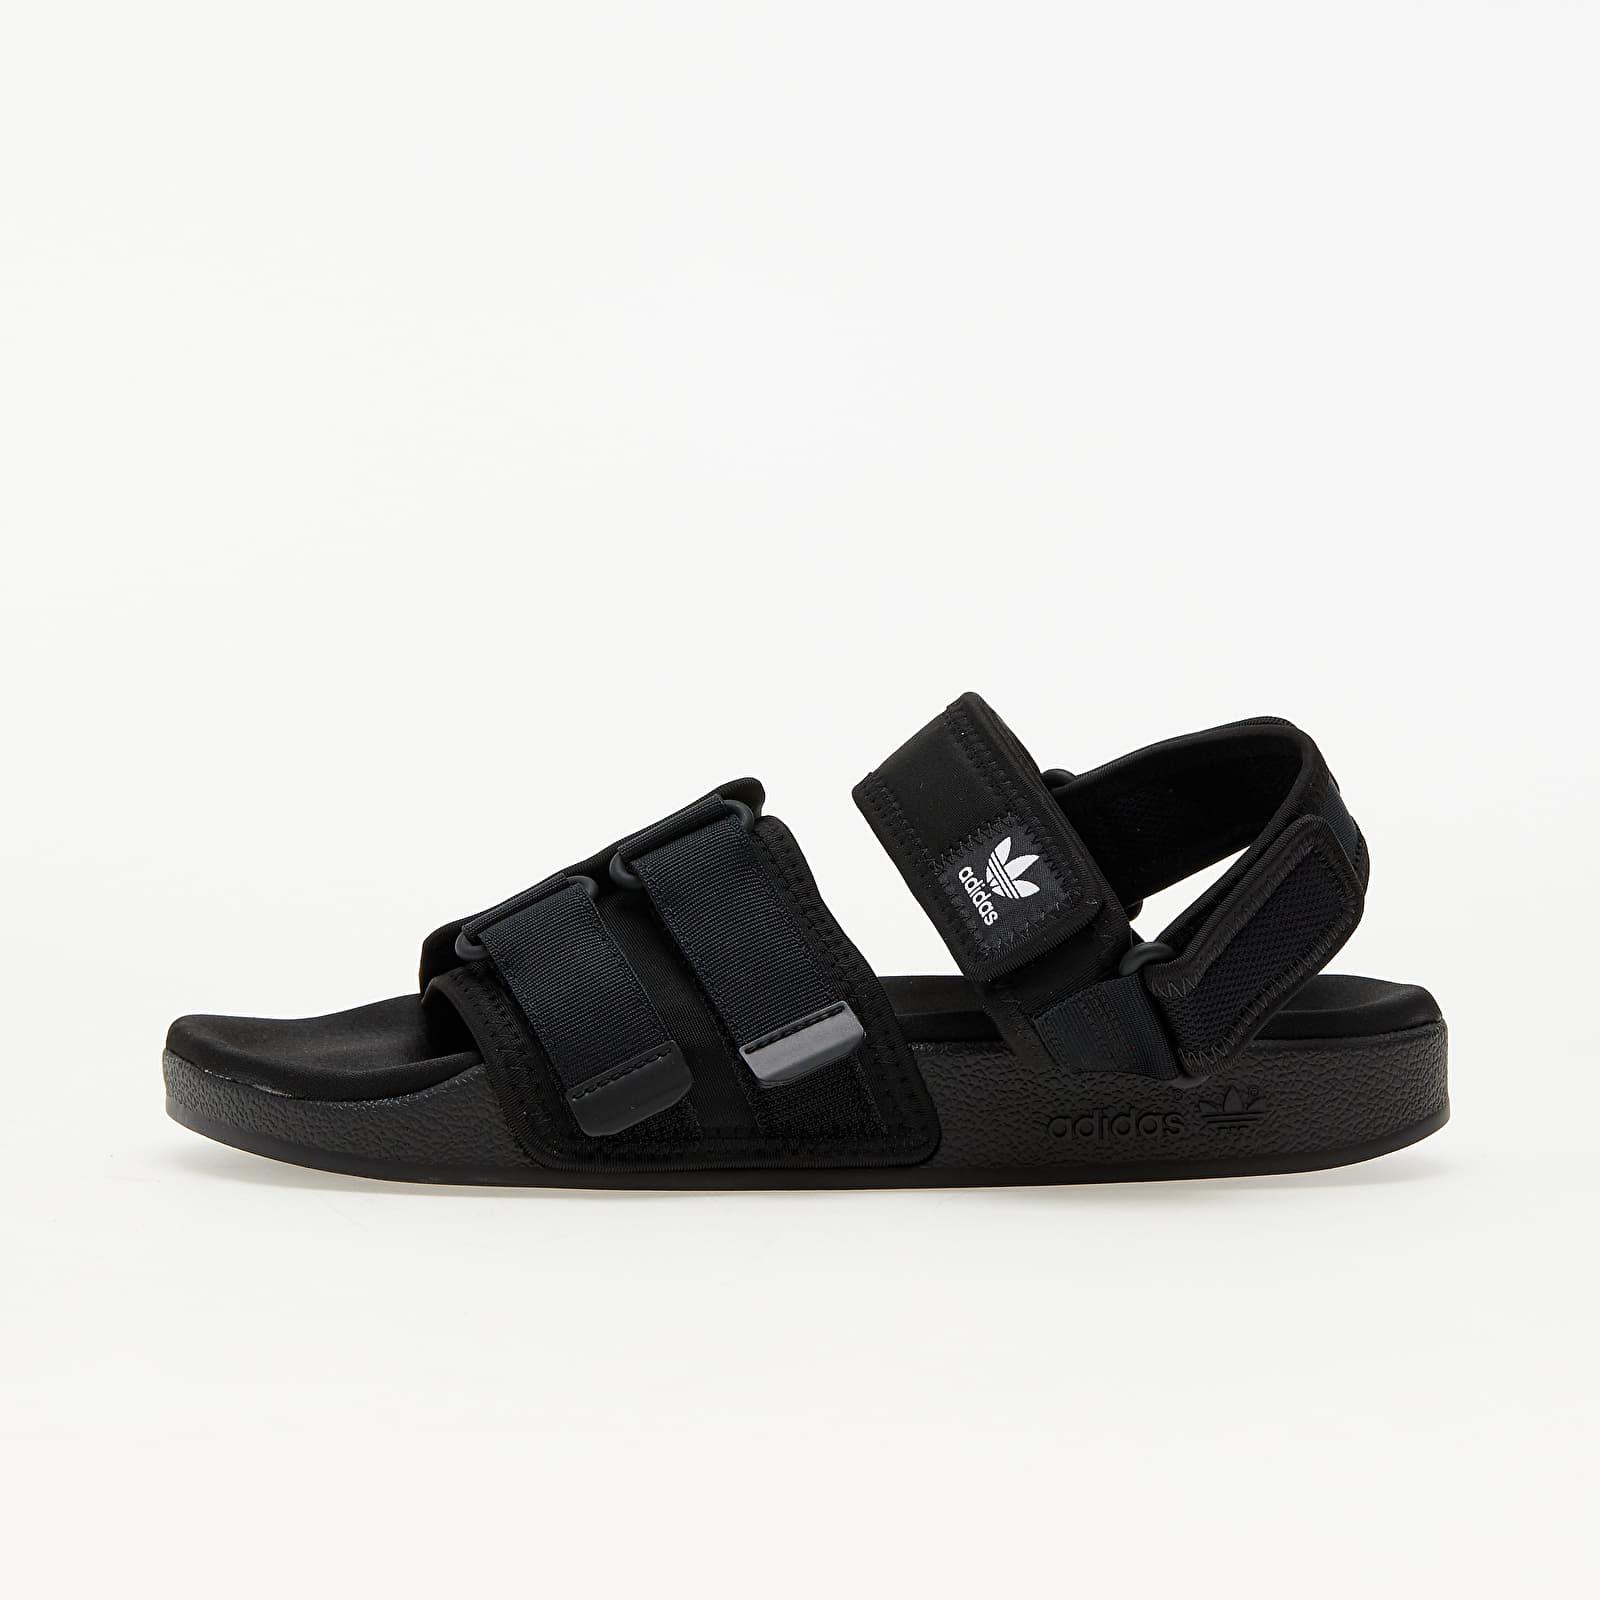 adidas Adilette Sandal 4.0 Core Black/ Core Black/ Ftw White EUR 40.5